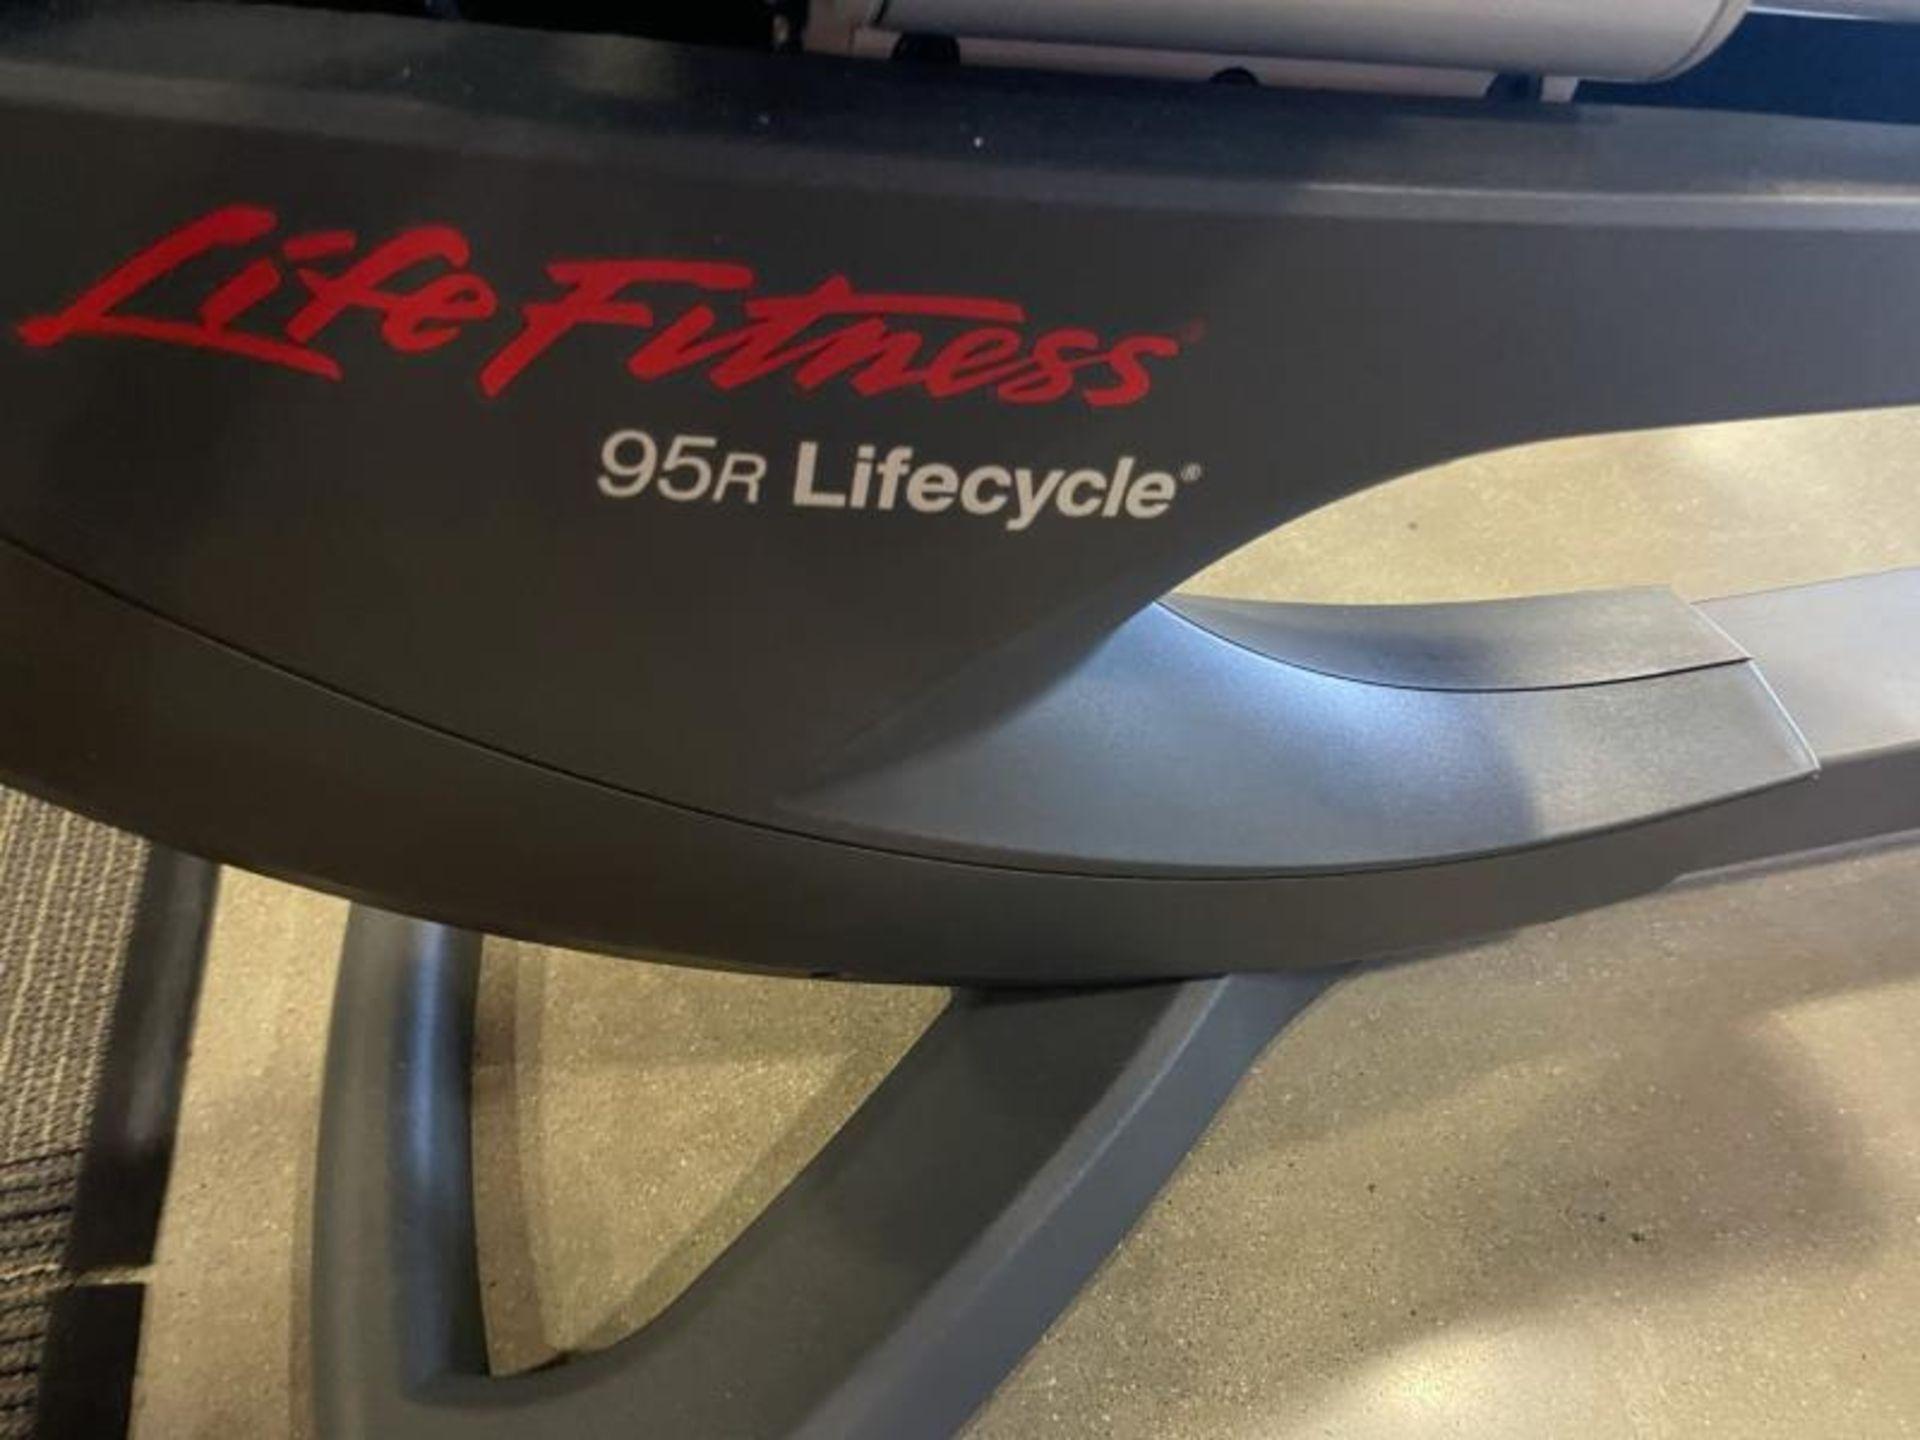 Life Fitness Lifecycle Recumbent Bike M: 95R - Image 2 of 4